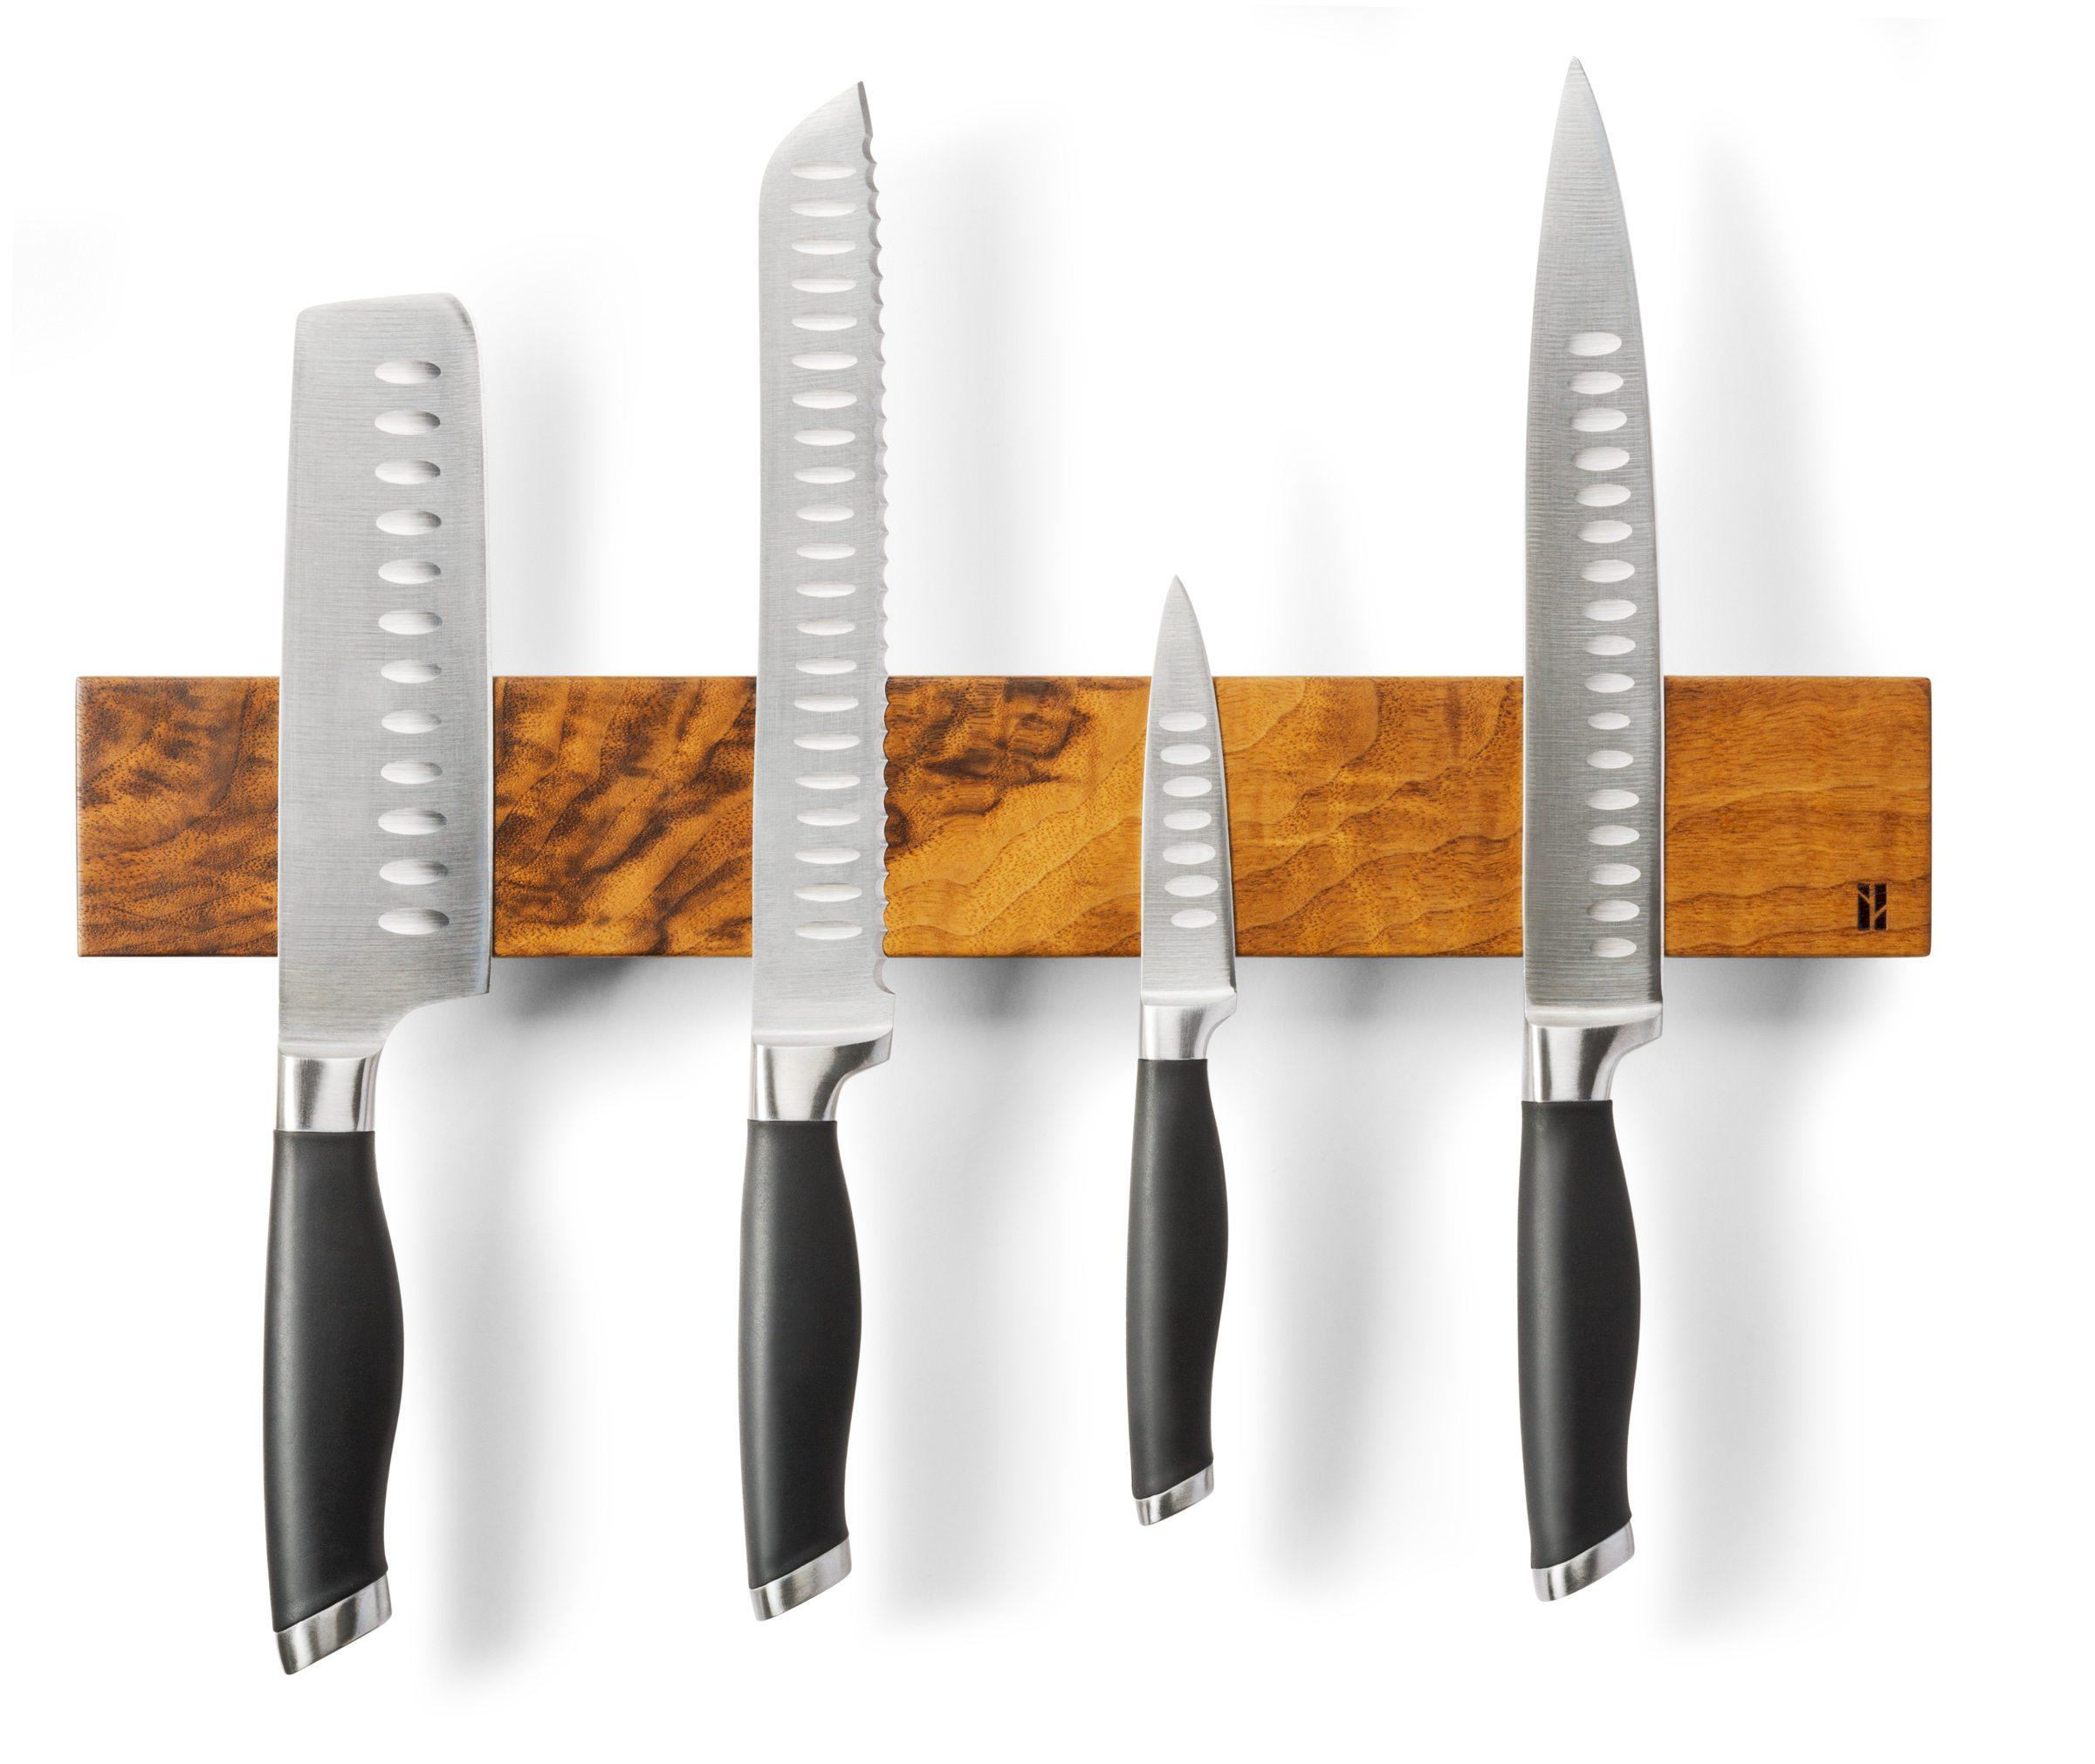 Magnetic knife holder in cherry wood $64 by Guillaume Gareau-Loyer, Beau Grain